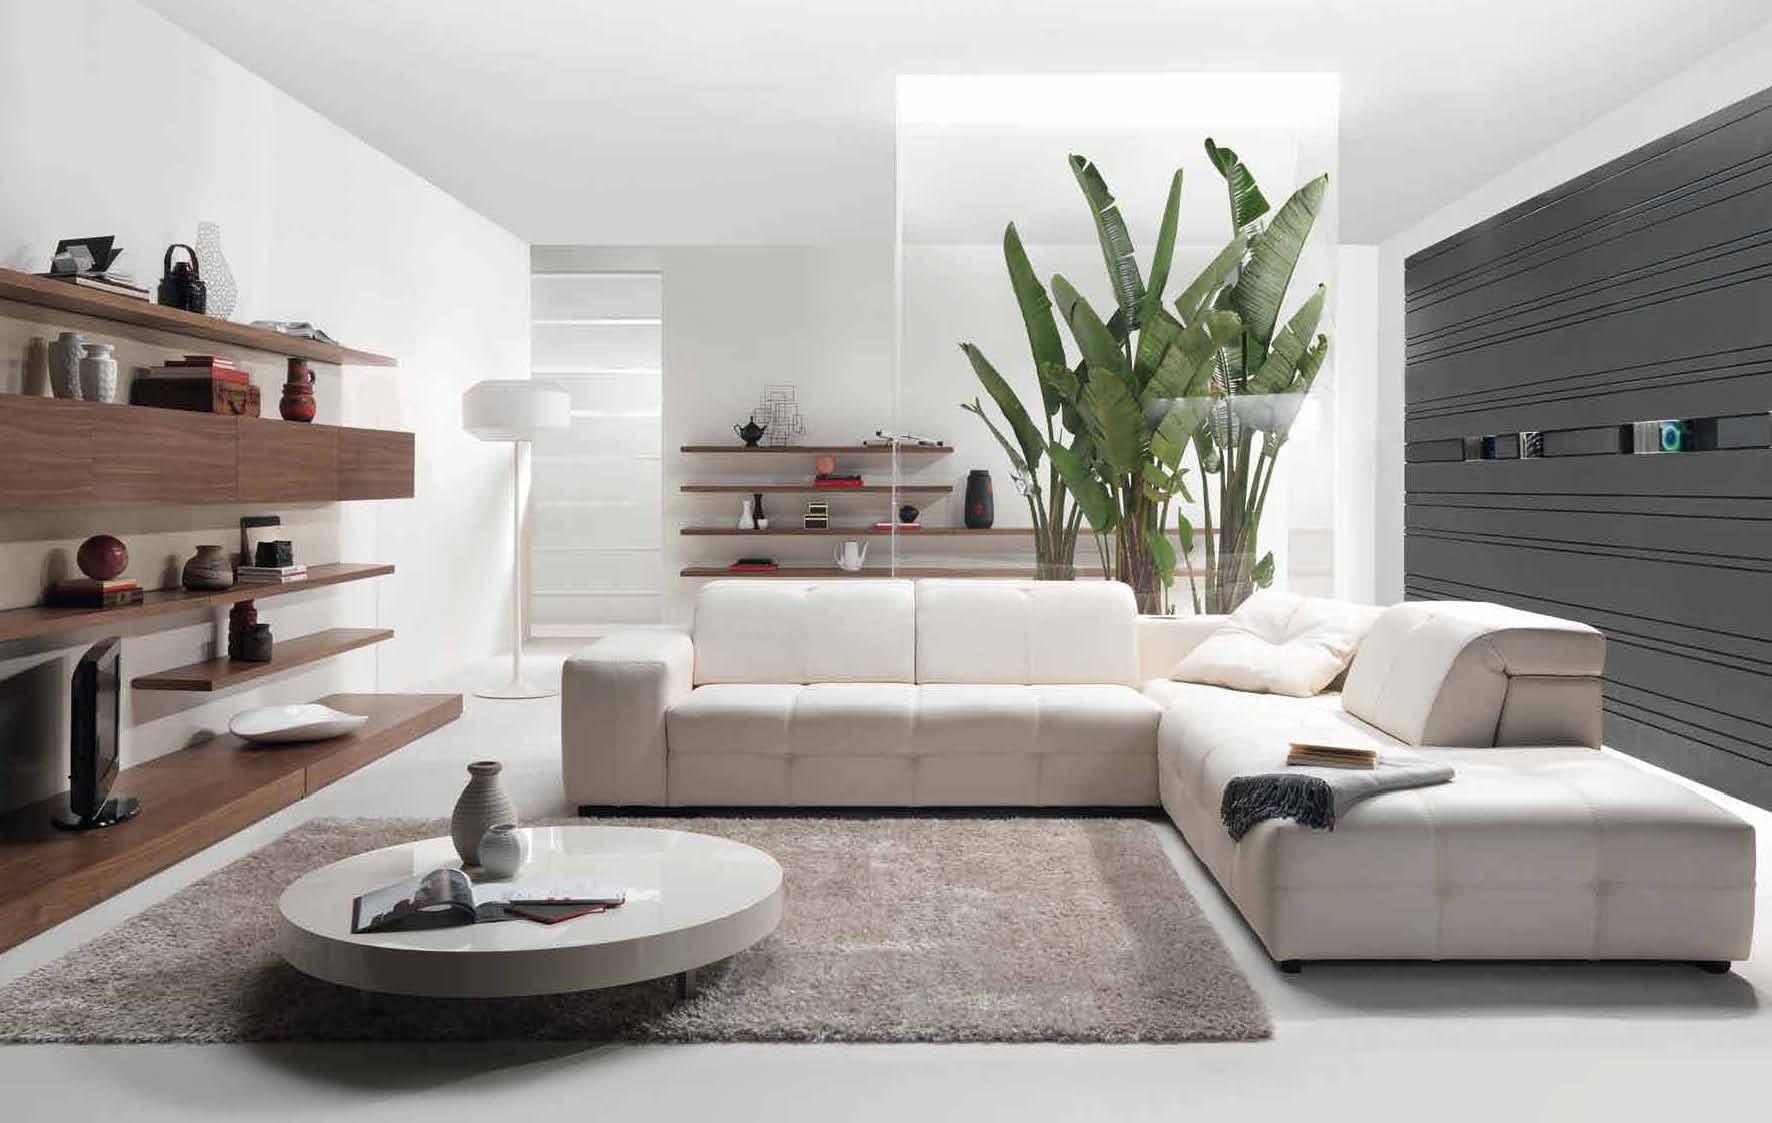 Minimalist Small Living Room Ideas Beautiful 7 Modern Decorating Style Must Haves Decorilla